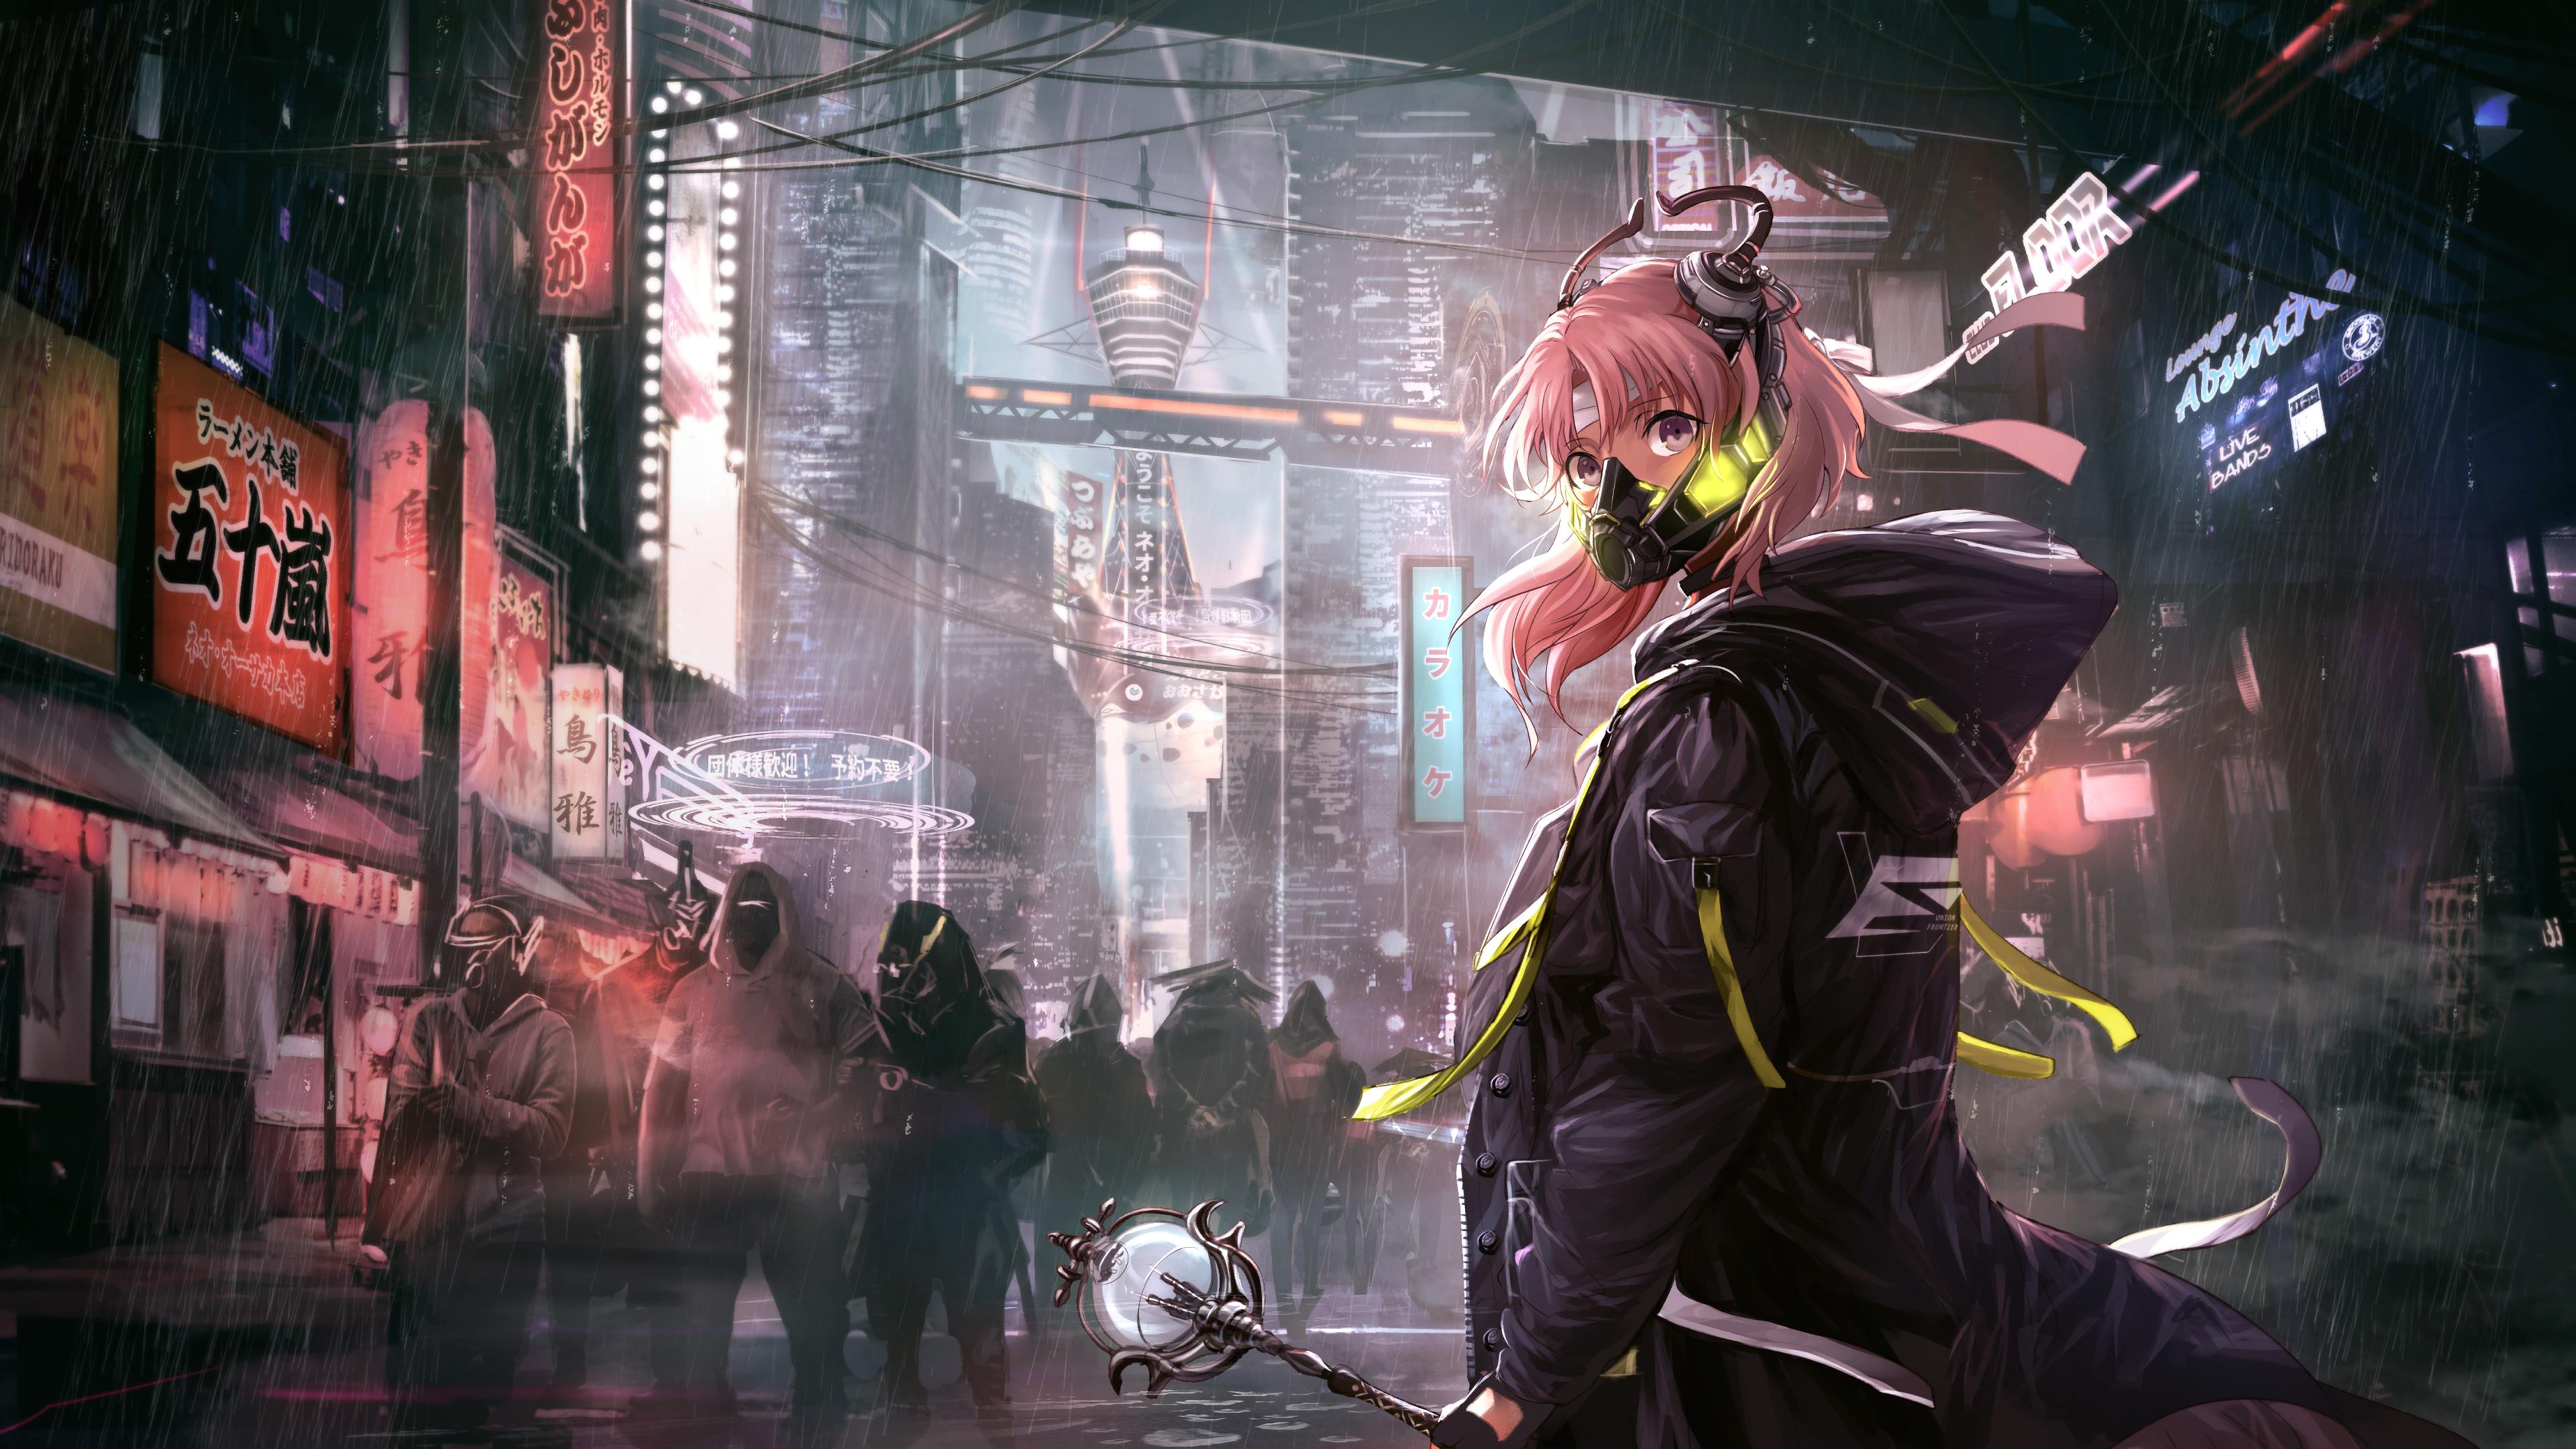 Anime, Girl, Mask, Cyberpunk, Sci-Fi, 4K, #168 Wallpaper